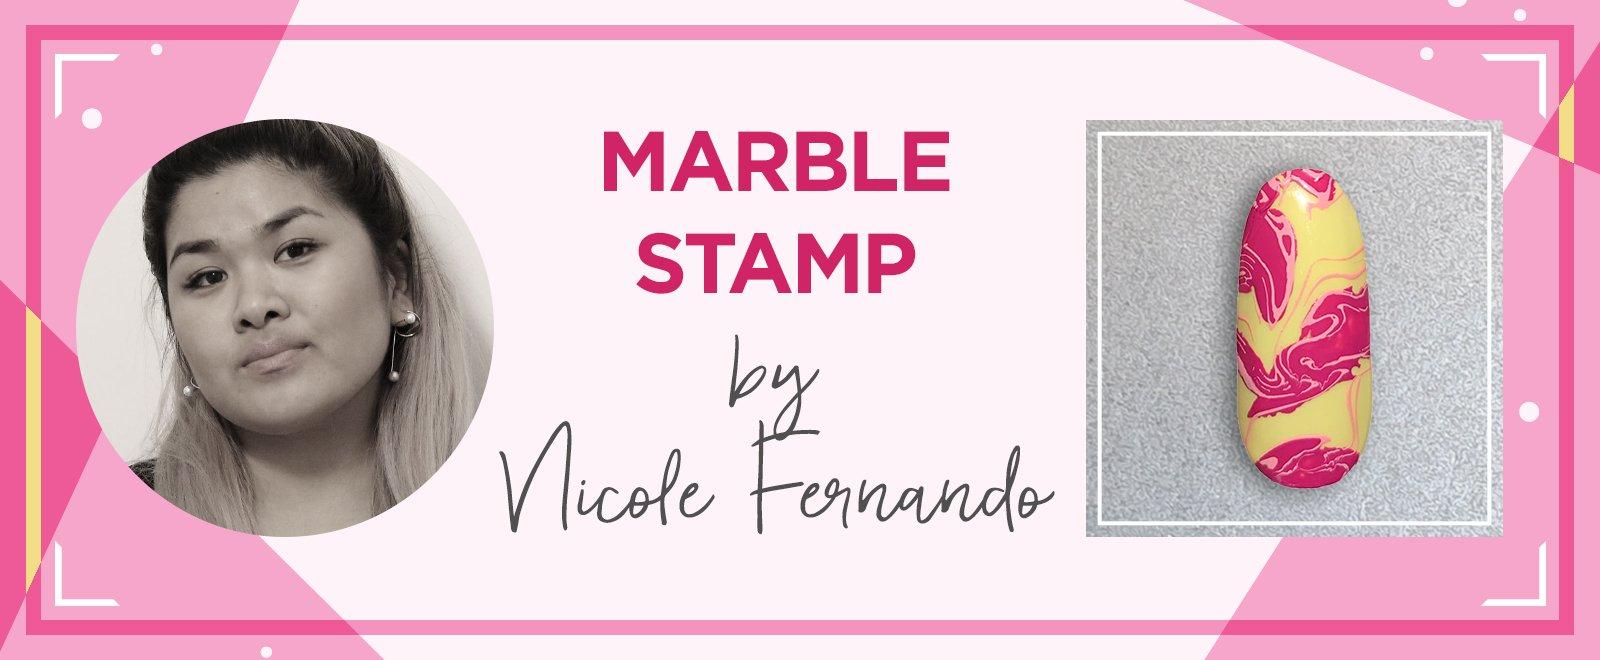 SBS_header_template_1600x660_marble-stamp_Nicole-Fernando